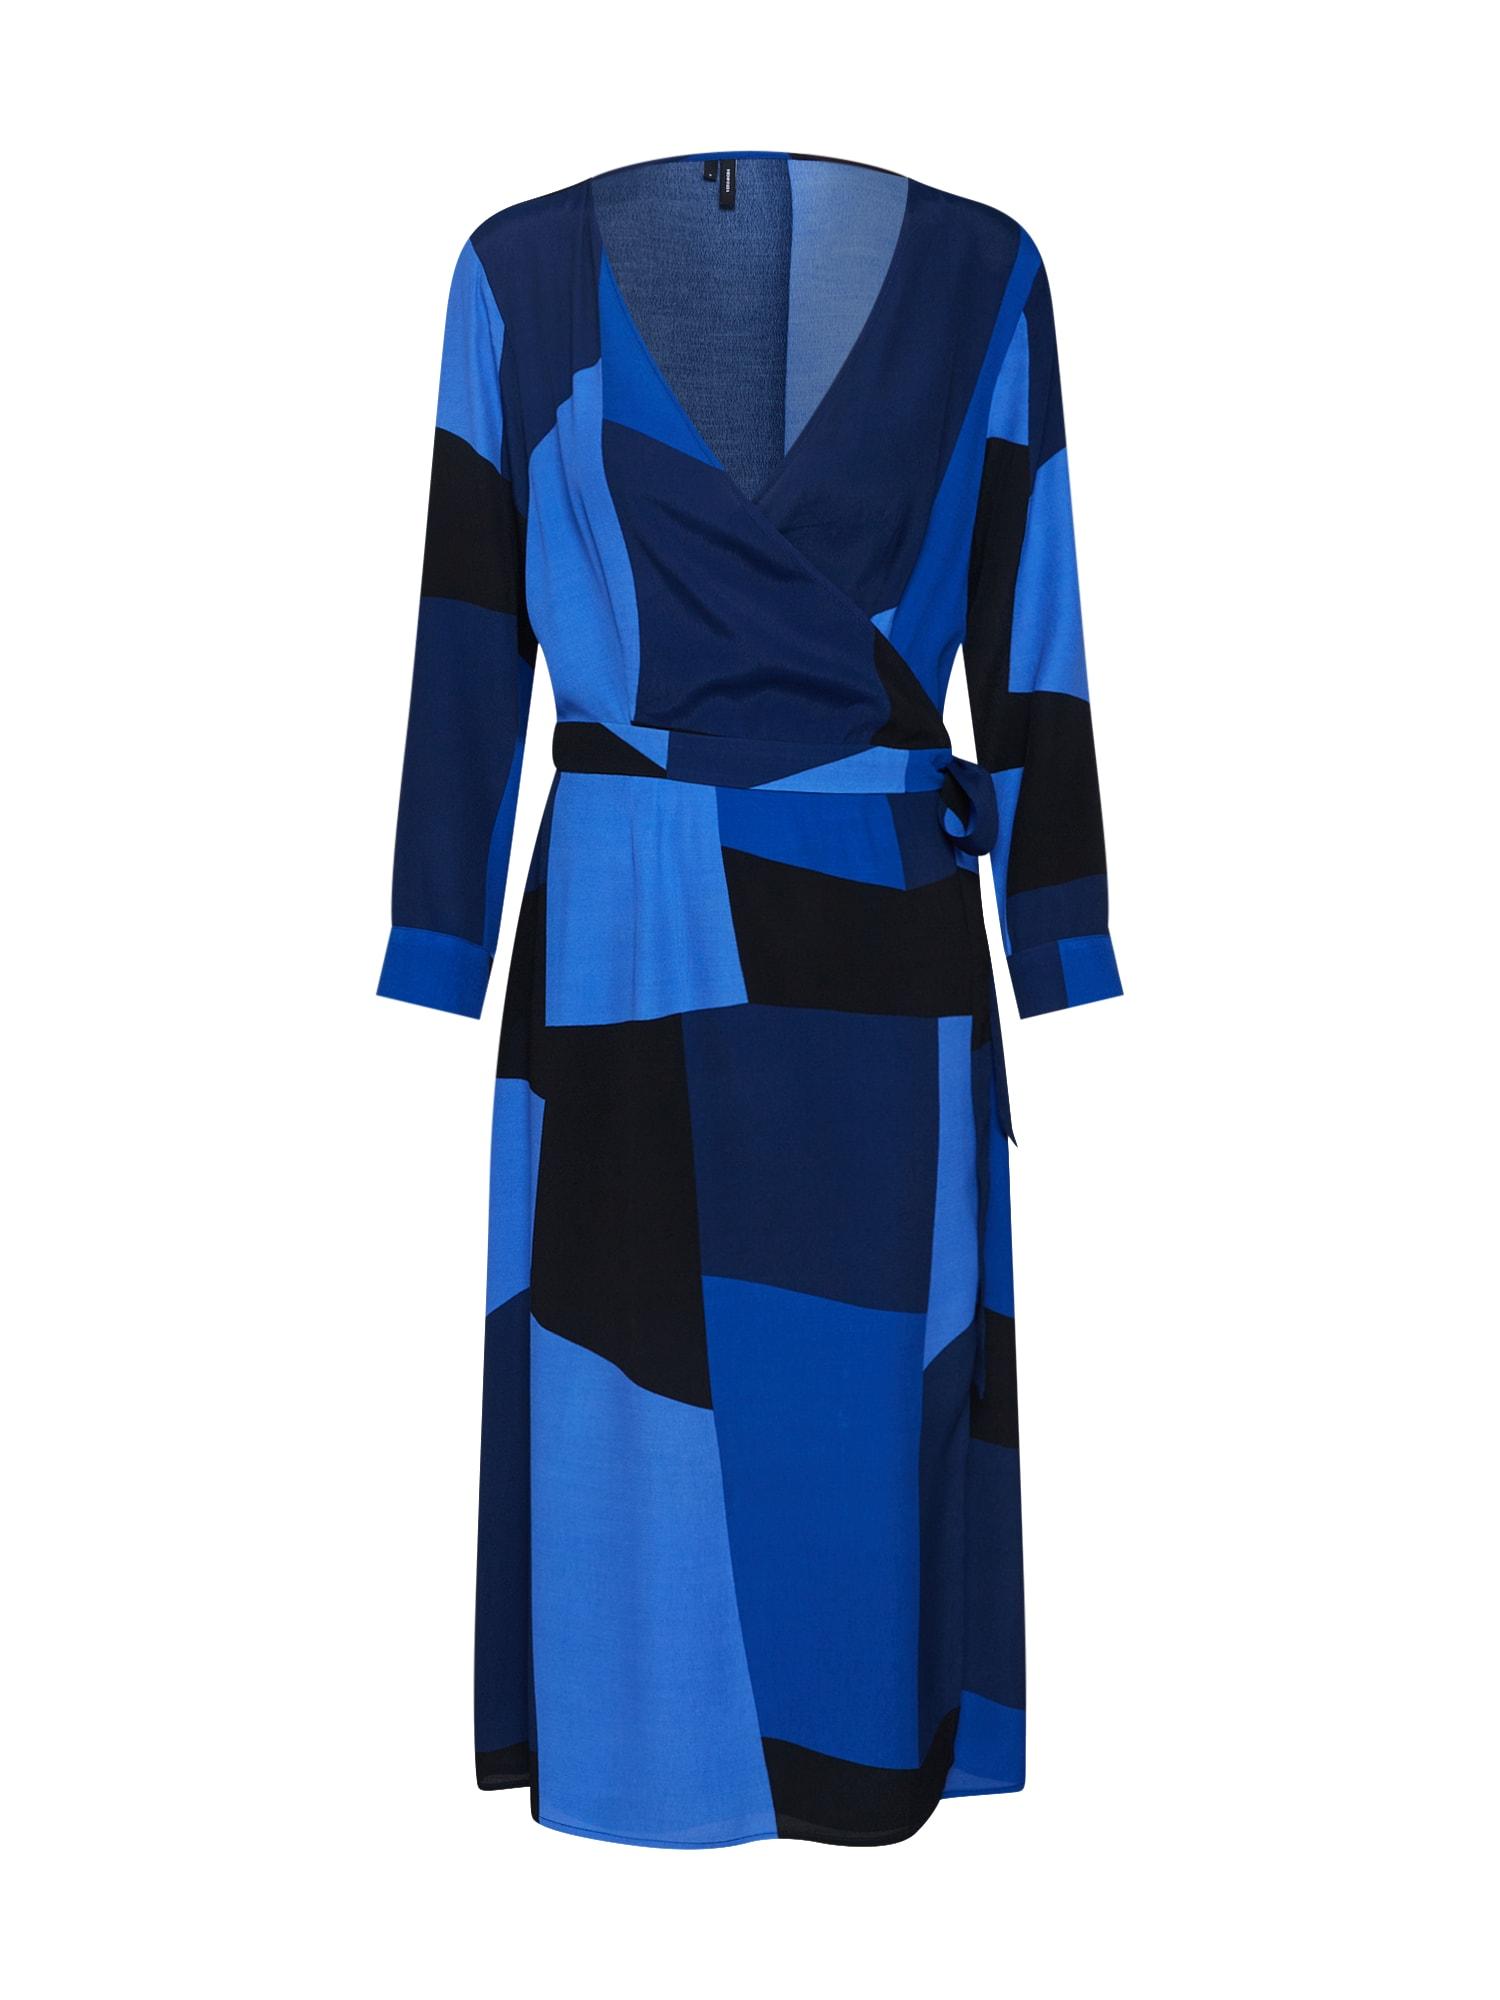 Šaty VMMOLLY WRAP 78 CALF DRESS světlemodrá tmavě modrá VERO MODA